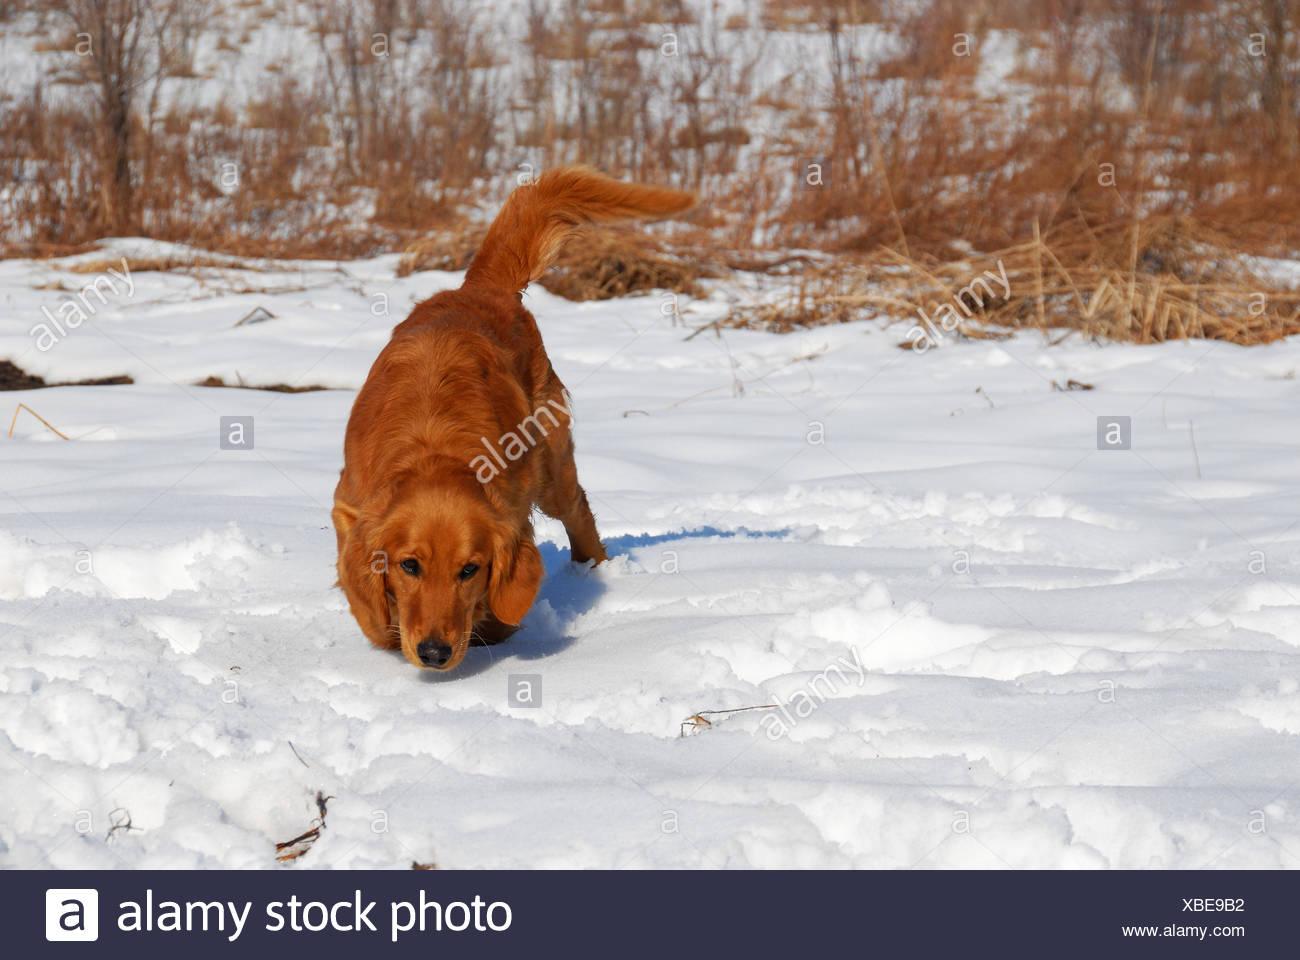 Dog smell - Stock Image